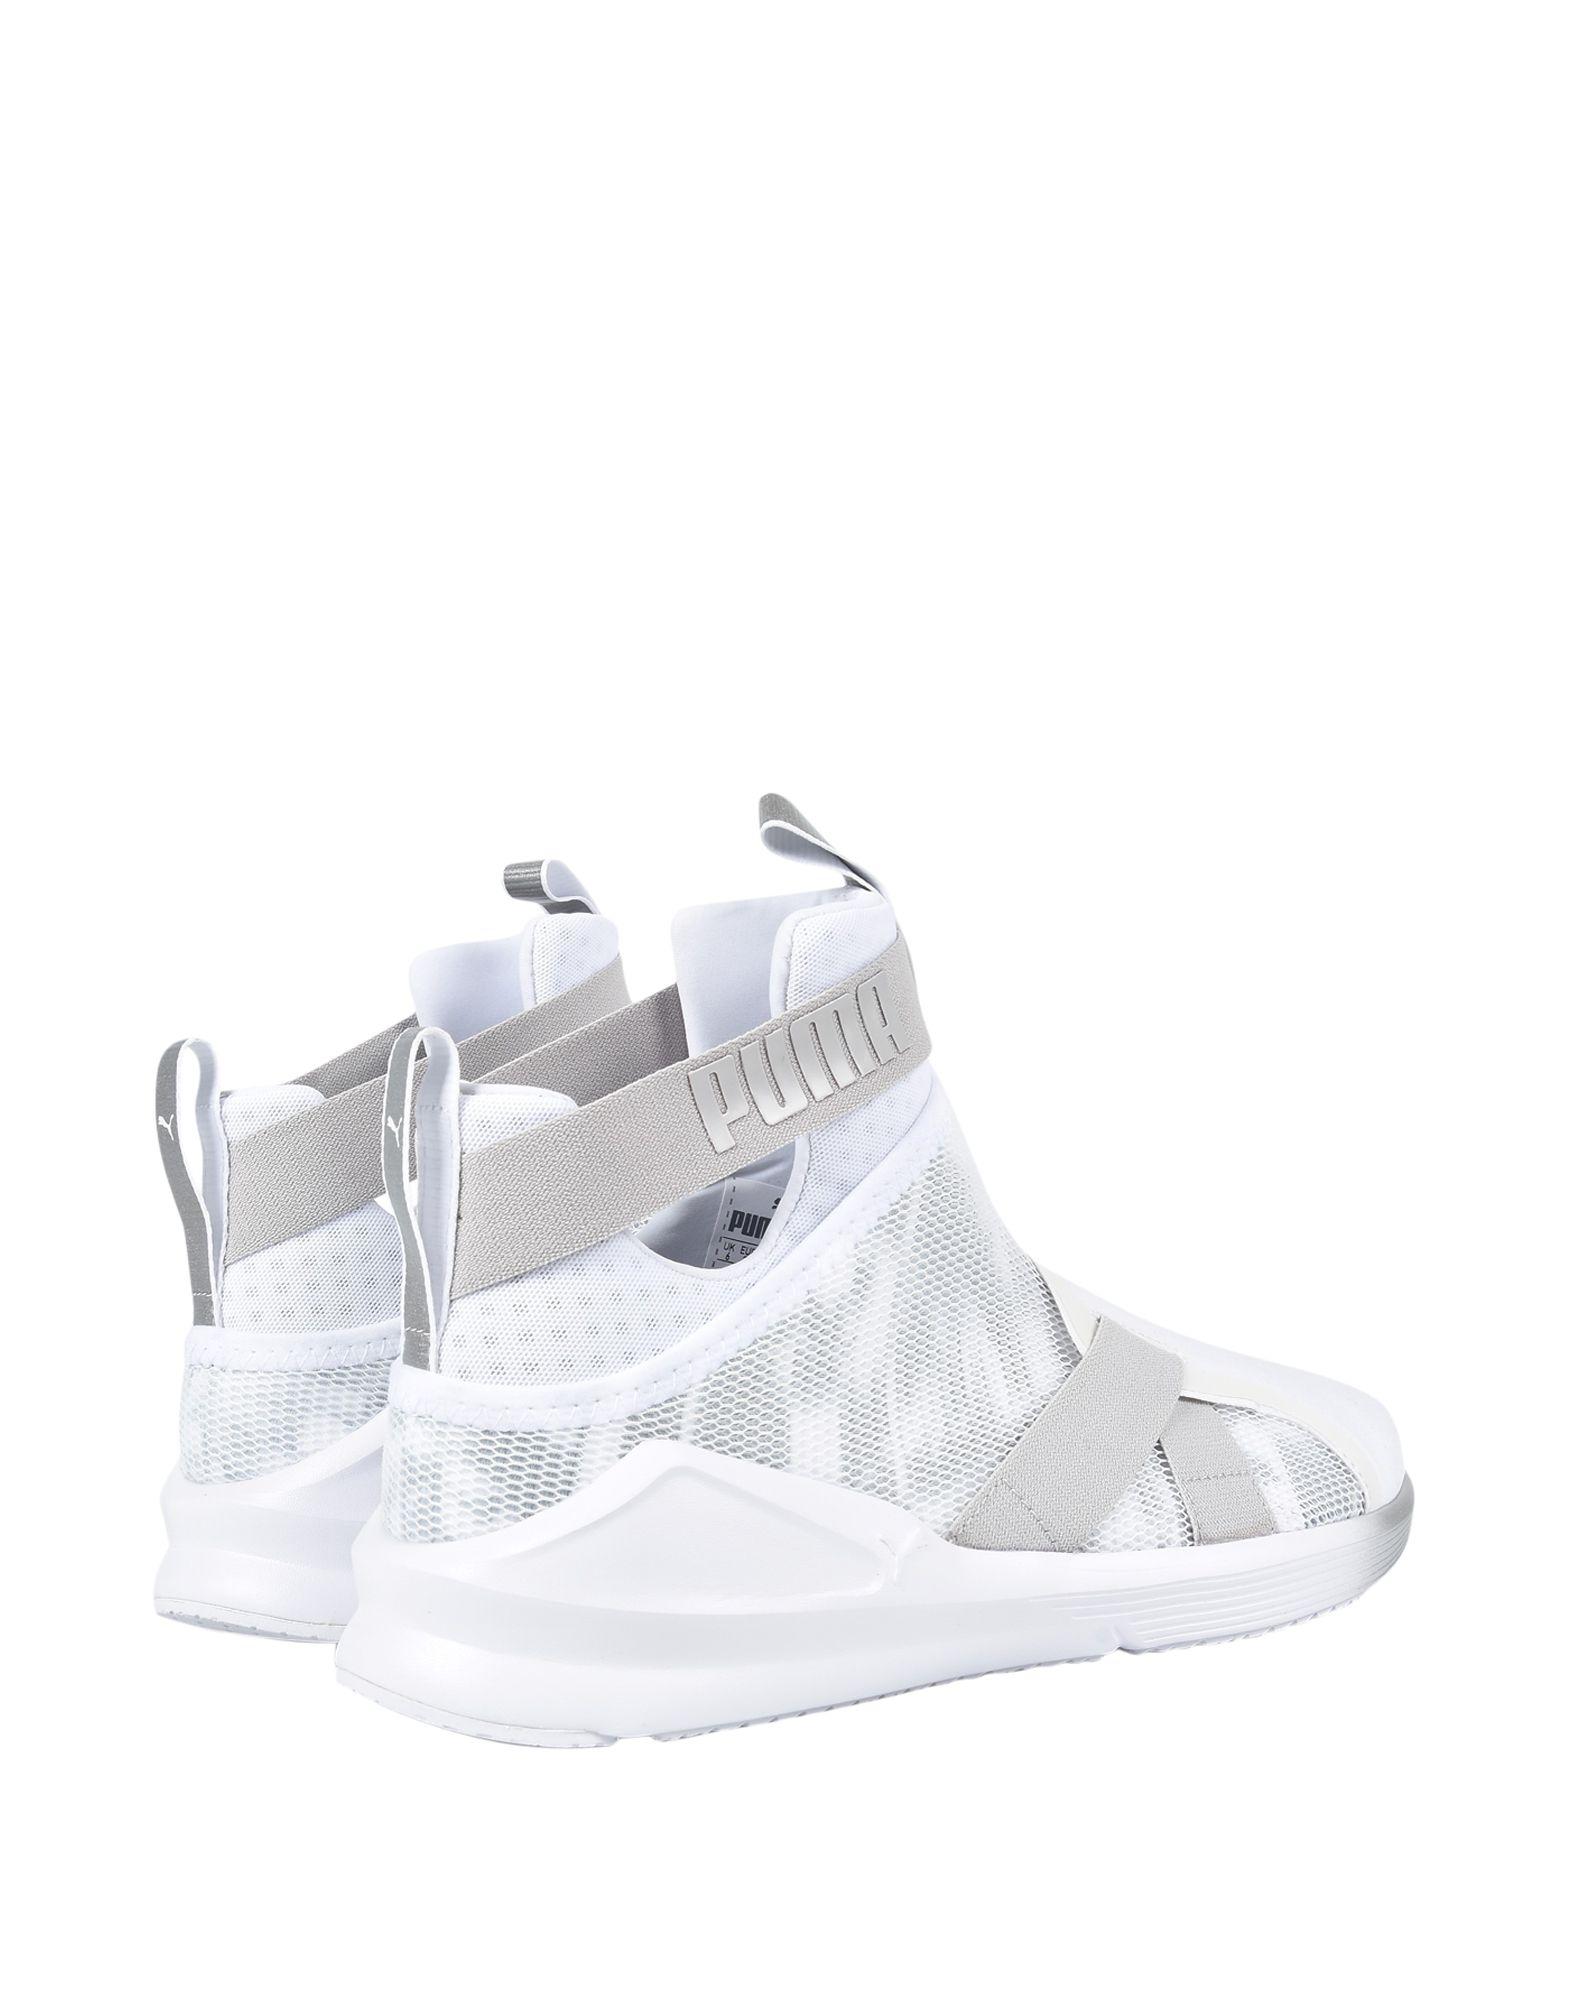 Sneakers Puma Fierce Strap Swan 11218932HI Wn's - Donna - 11218932HI Swan 3486f2